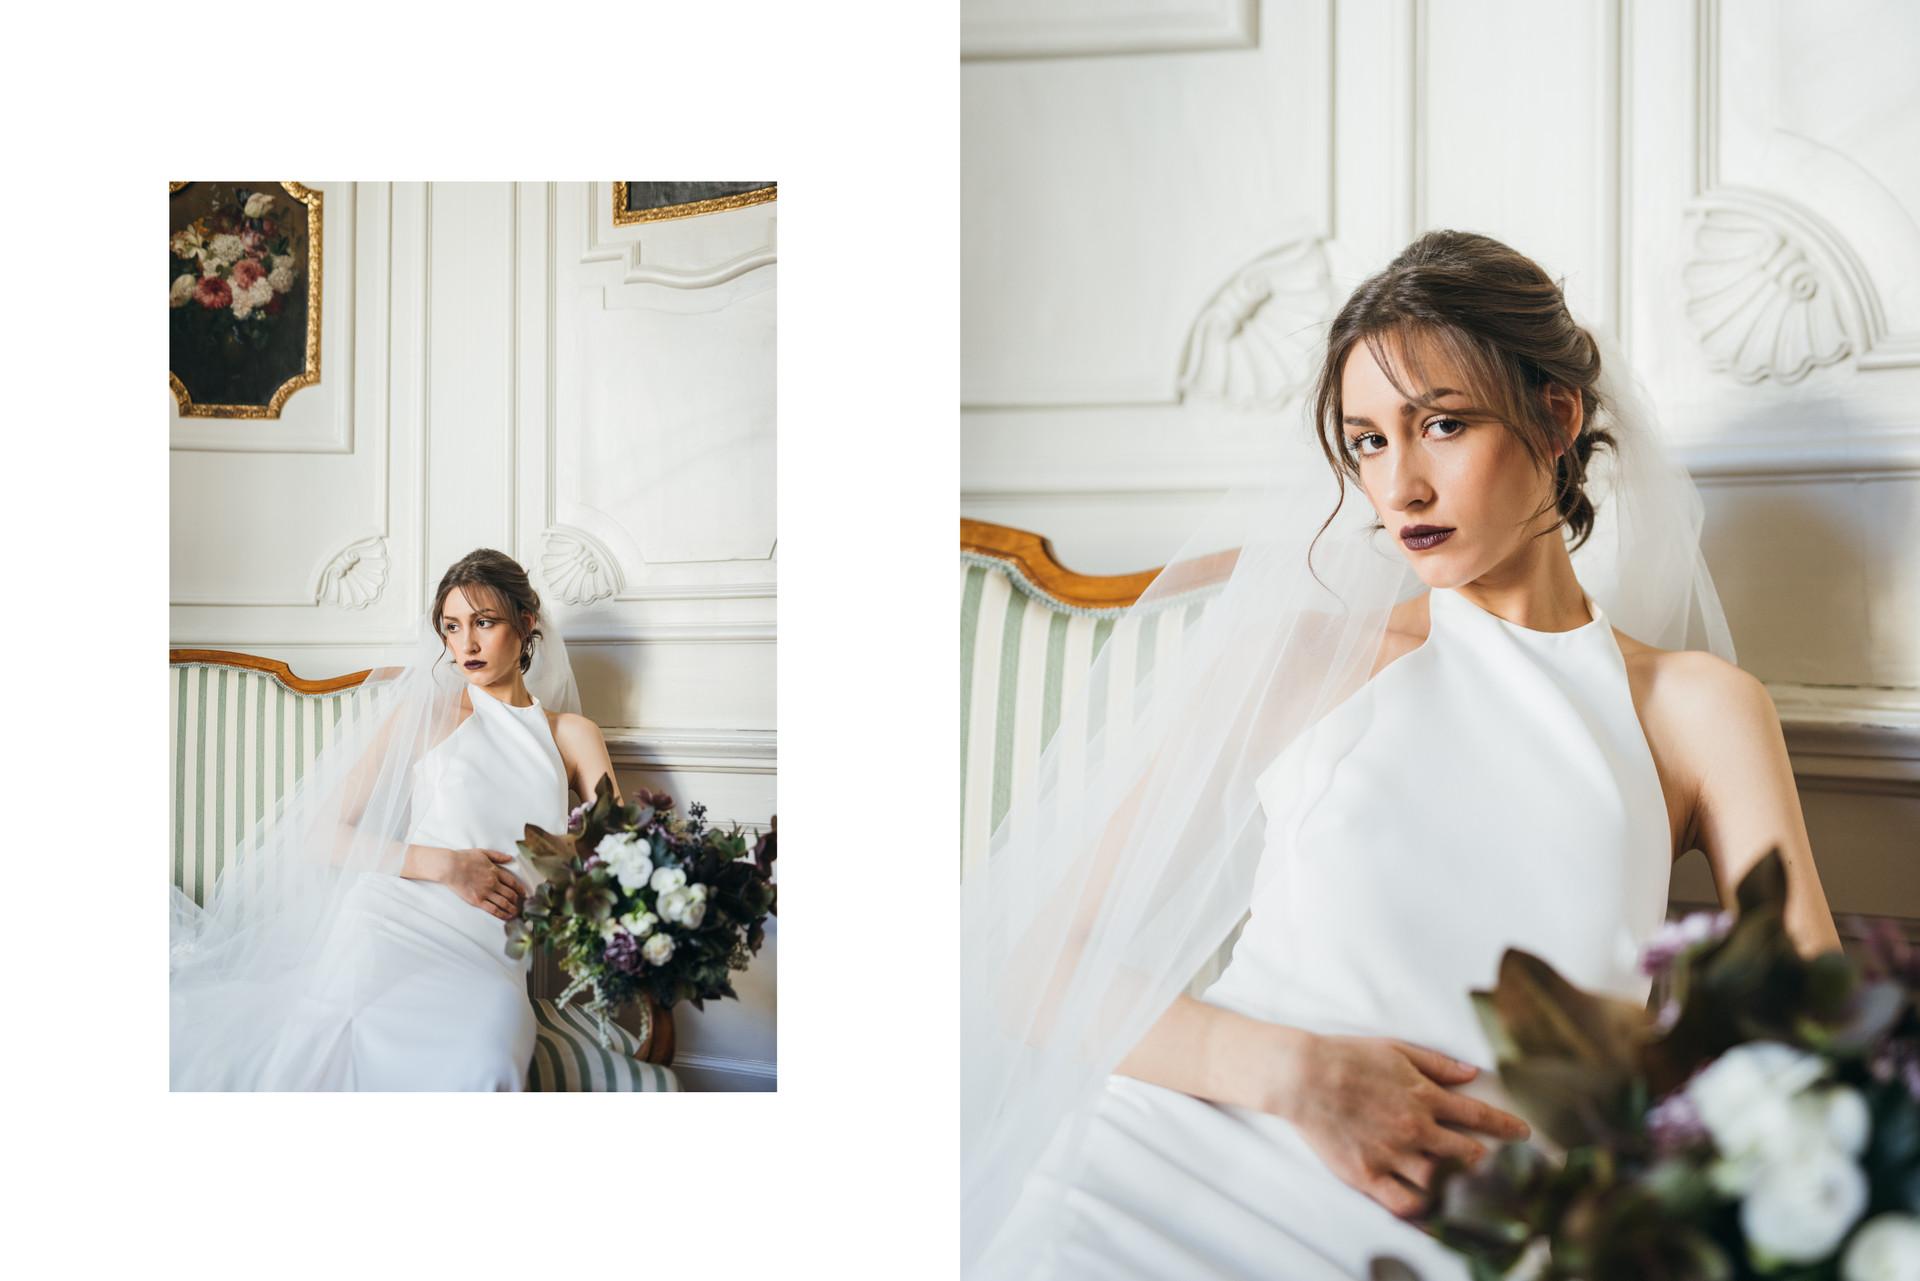 Bridal Shooting Collage 2.jpg